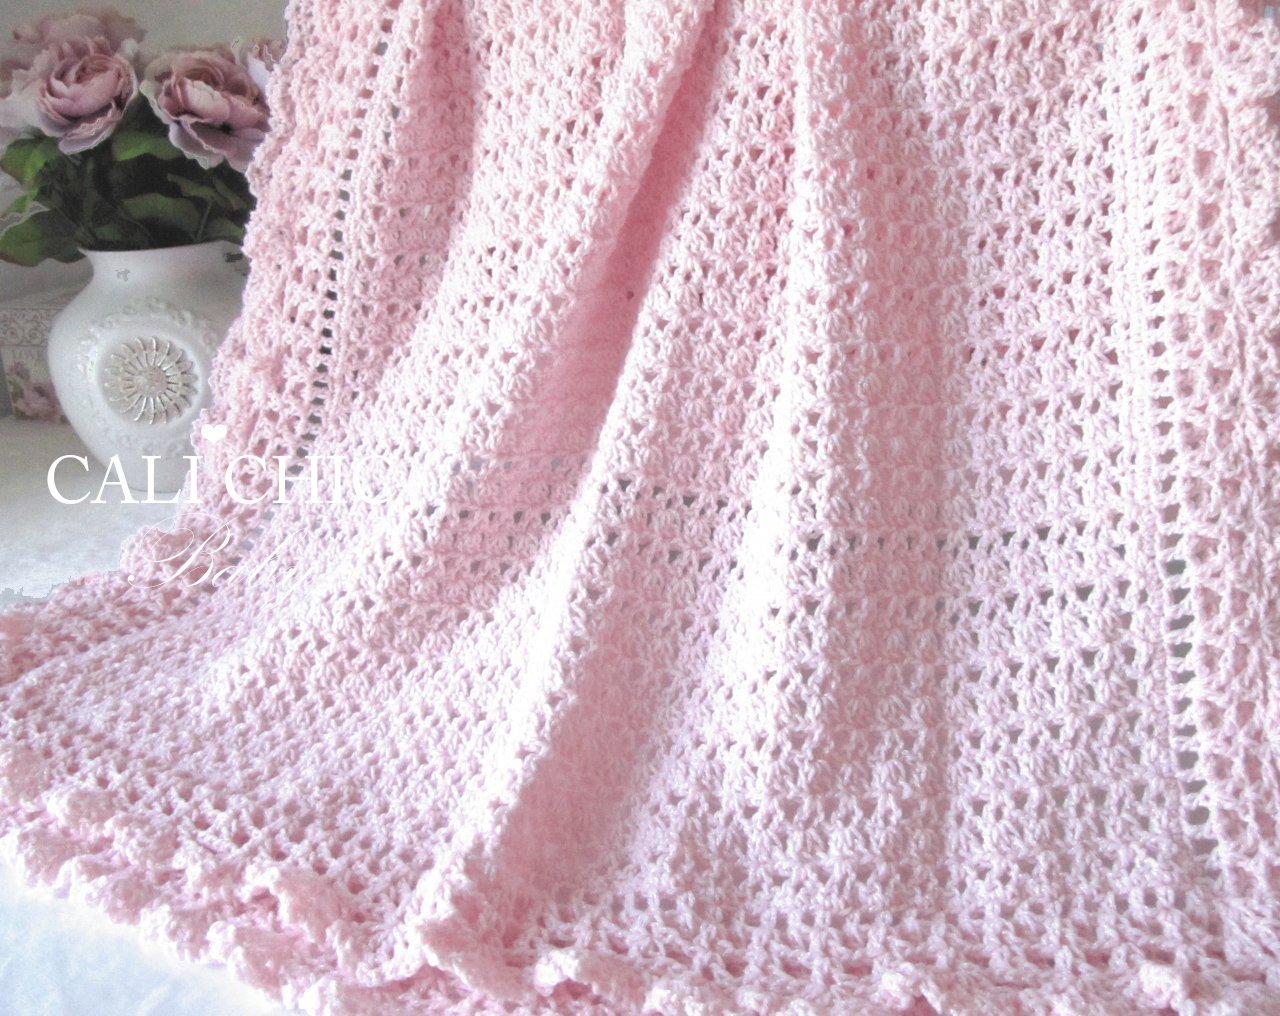 Victoriancrochetbaby Blanketpattern 89 Cali Chic Baby